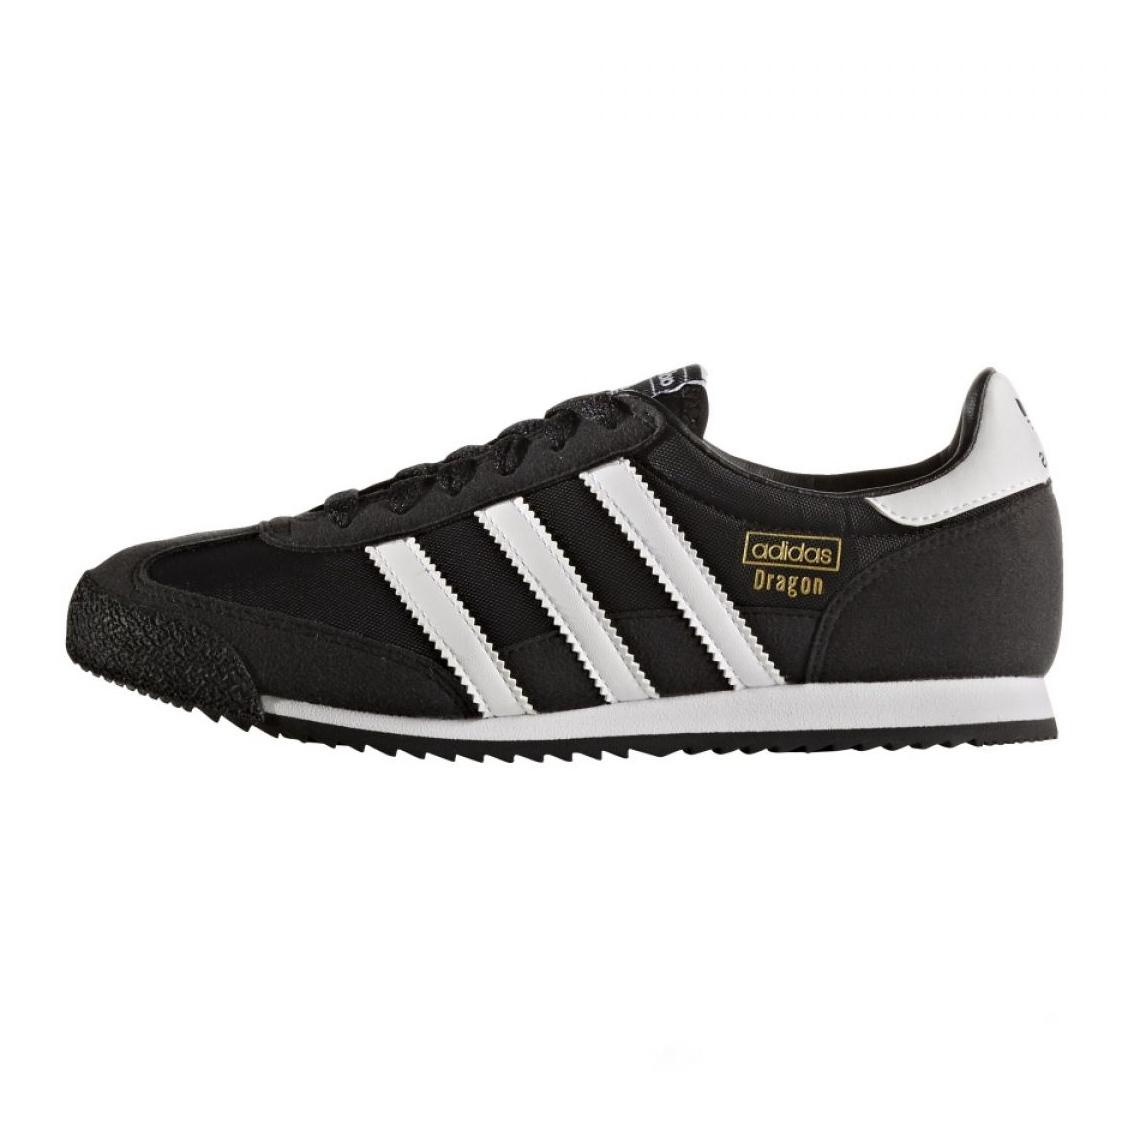 Adidas Originals Dragon Og Jr BB2487 shoes black